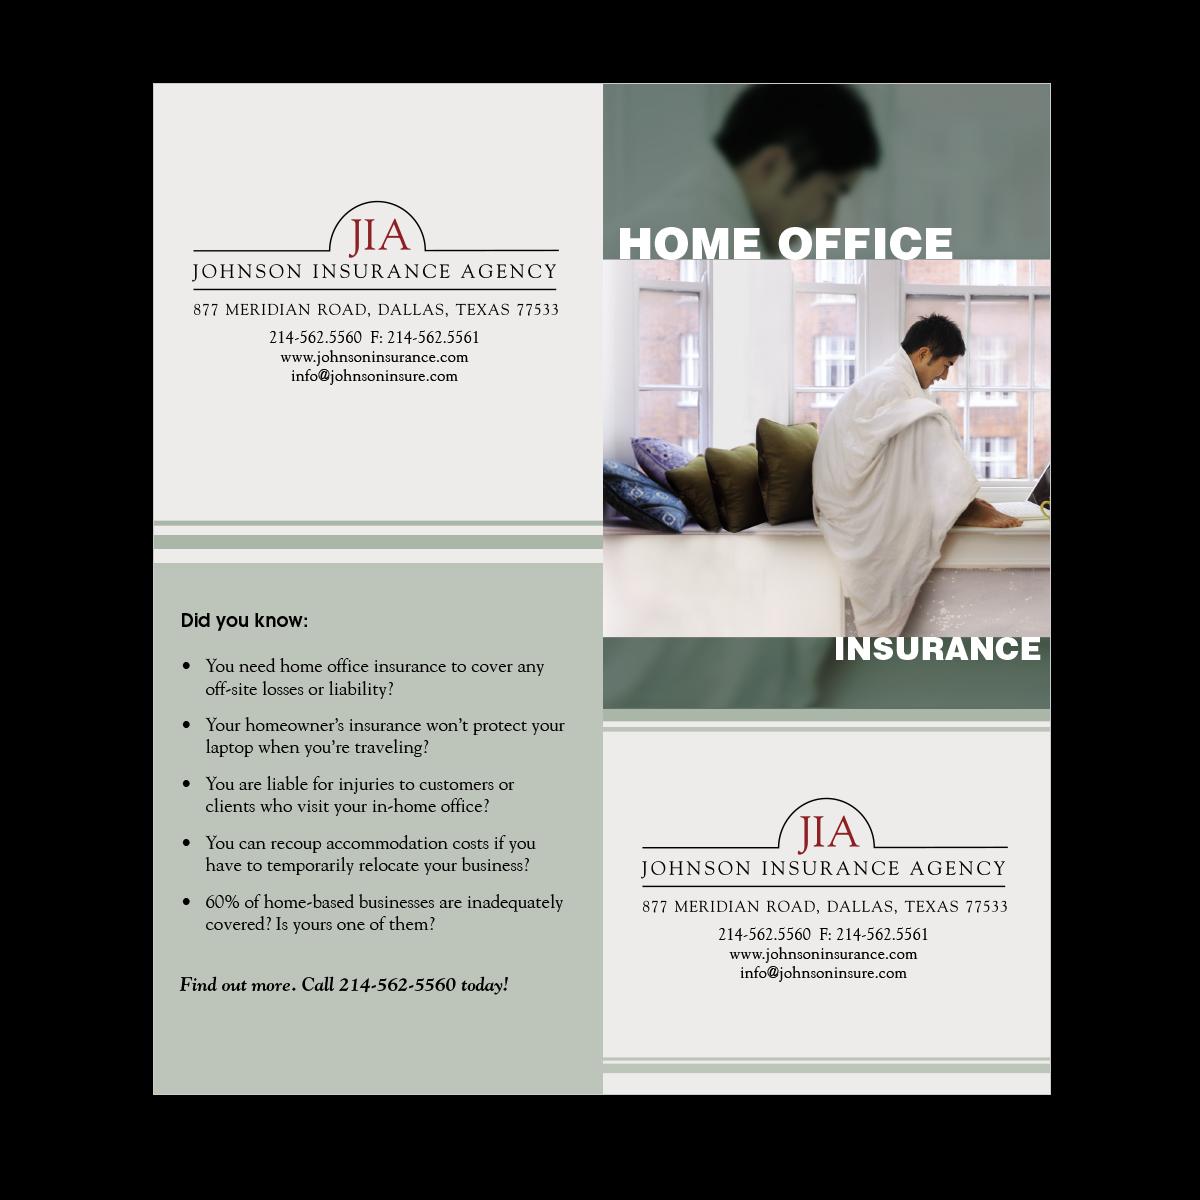 Home Office Insurance Brochure | Mines Press